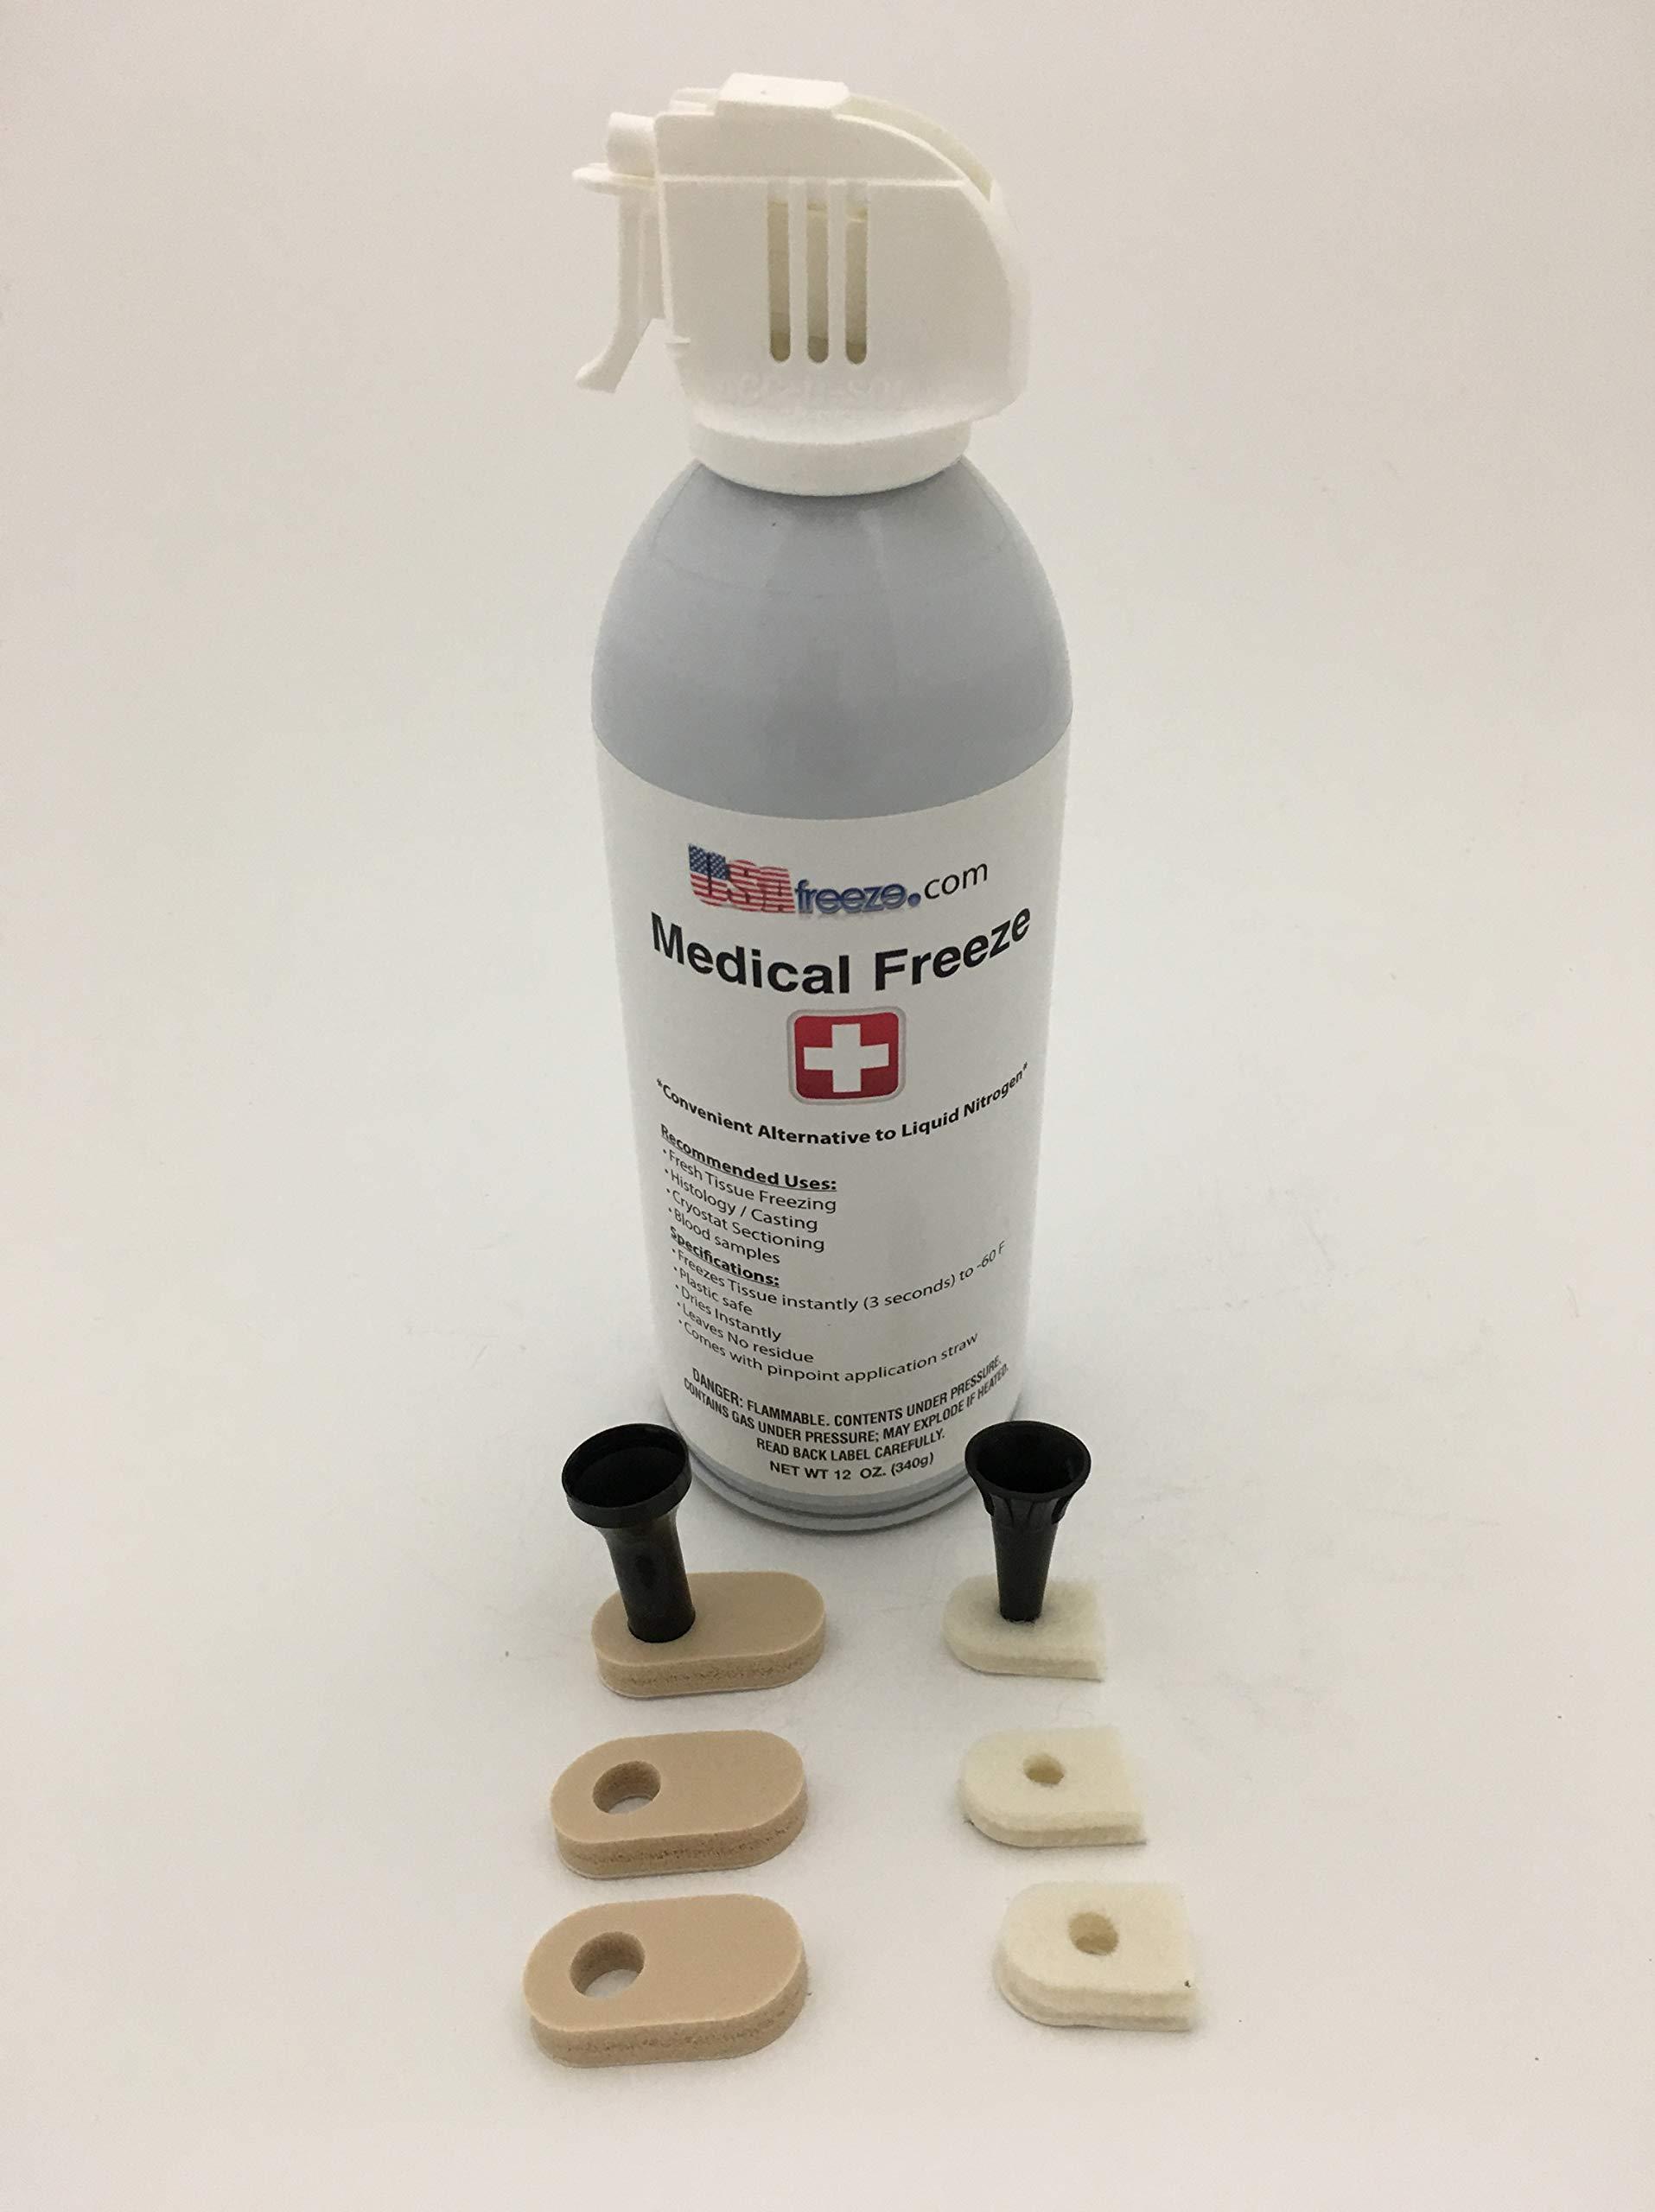 USA Freeze MF-65-2FP Medical Freeze Aerosol Spray w/2 Speculum funnels, 12 Custom Application Pads, Dispensing Straw 3.5oz